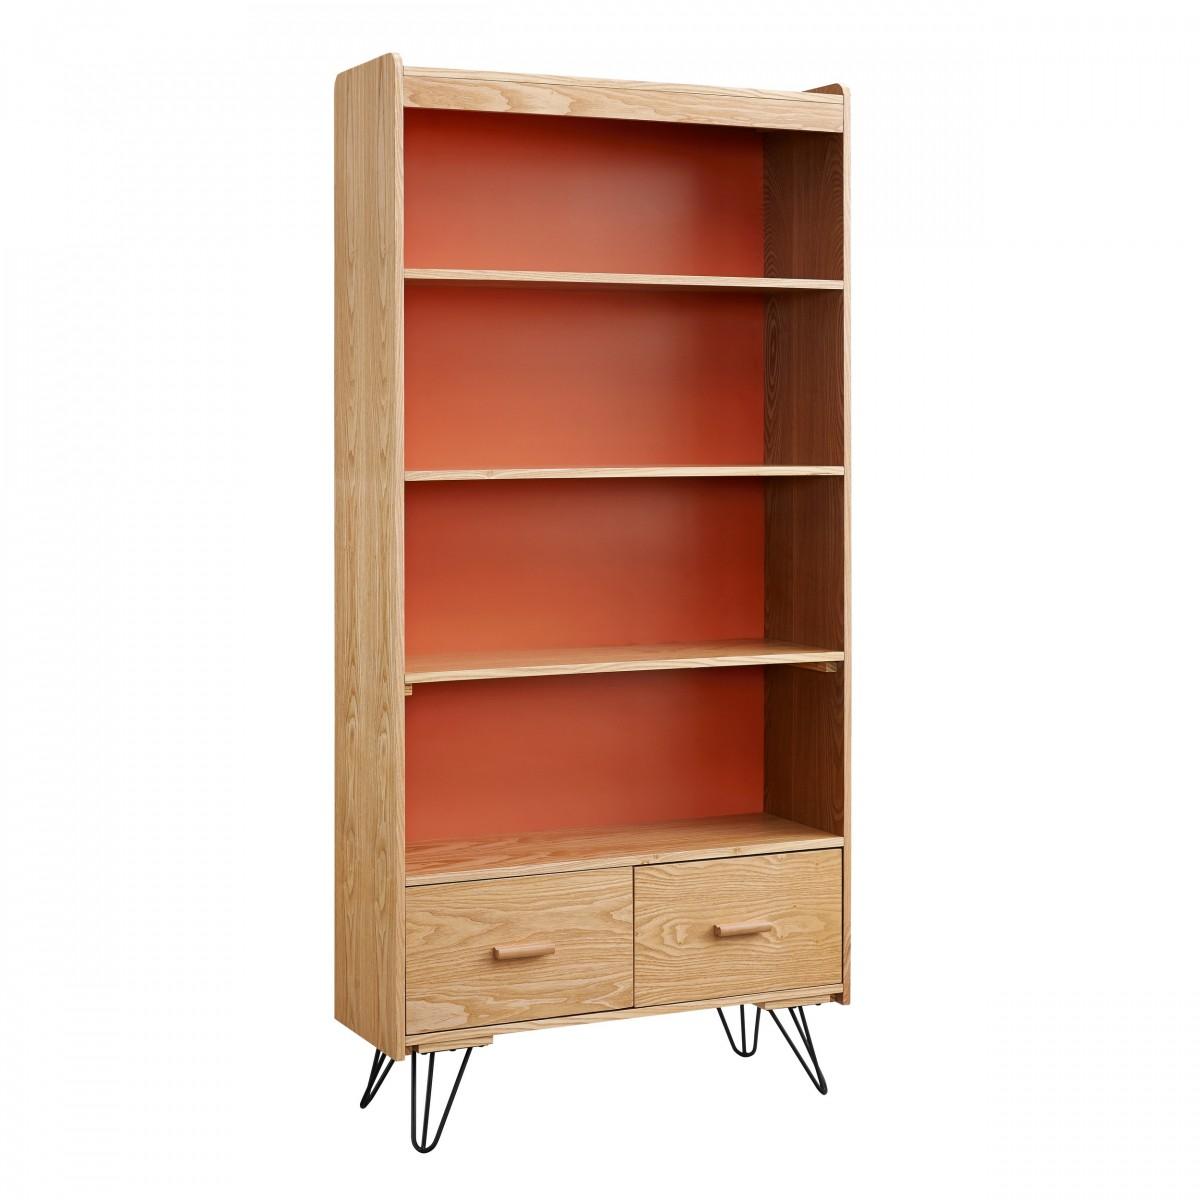 Home Decor Inc: Linon Home Decor Products Inc. Perry Natural & Orange